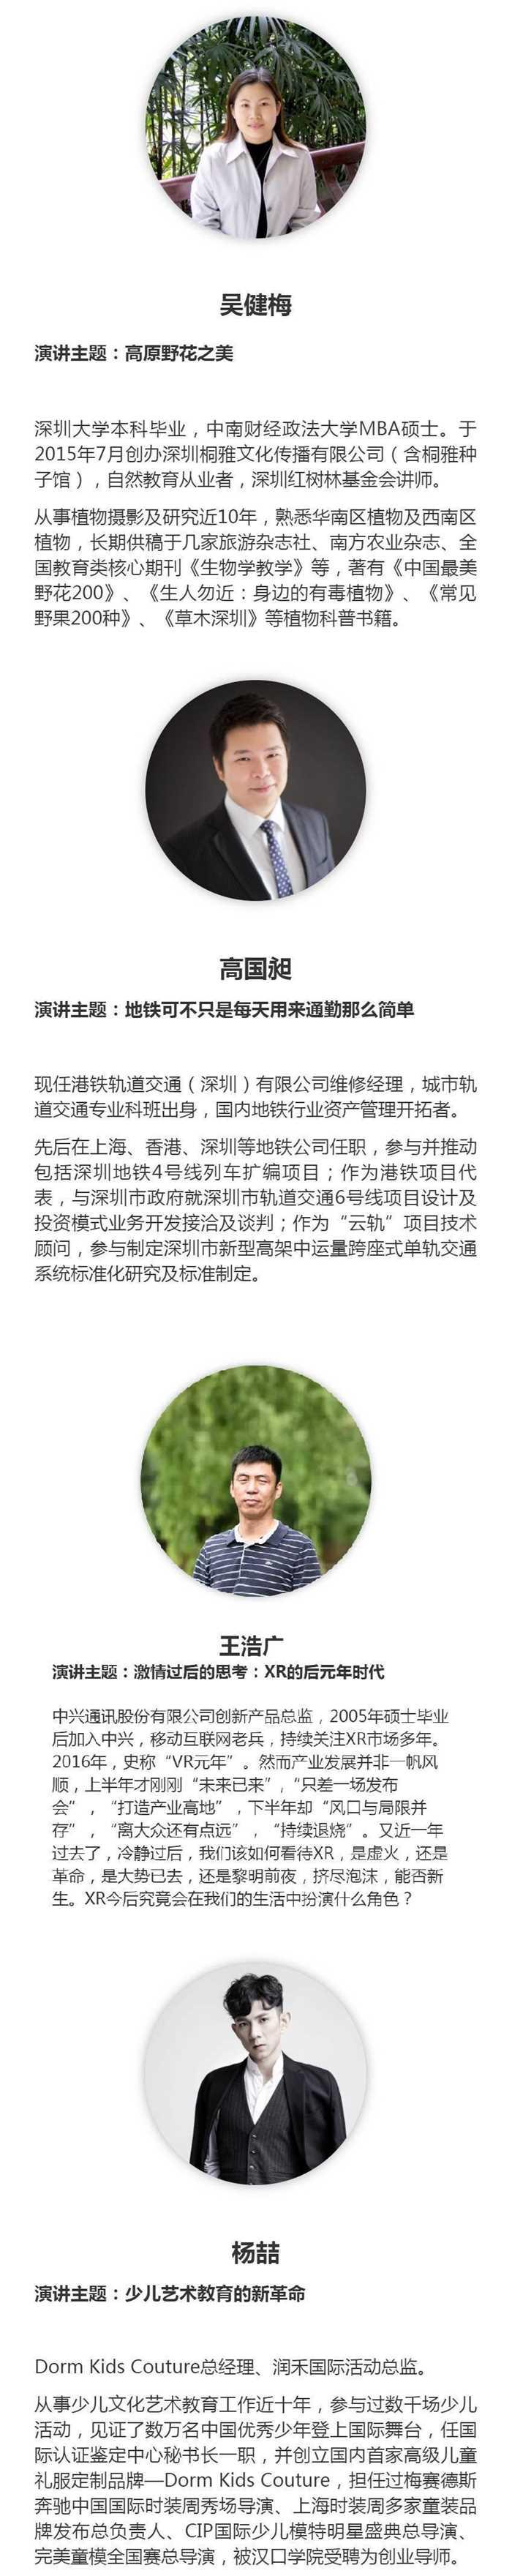 www.huodongxing.com_event_14142412094002.jpg